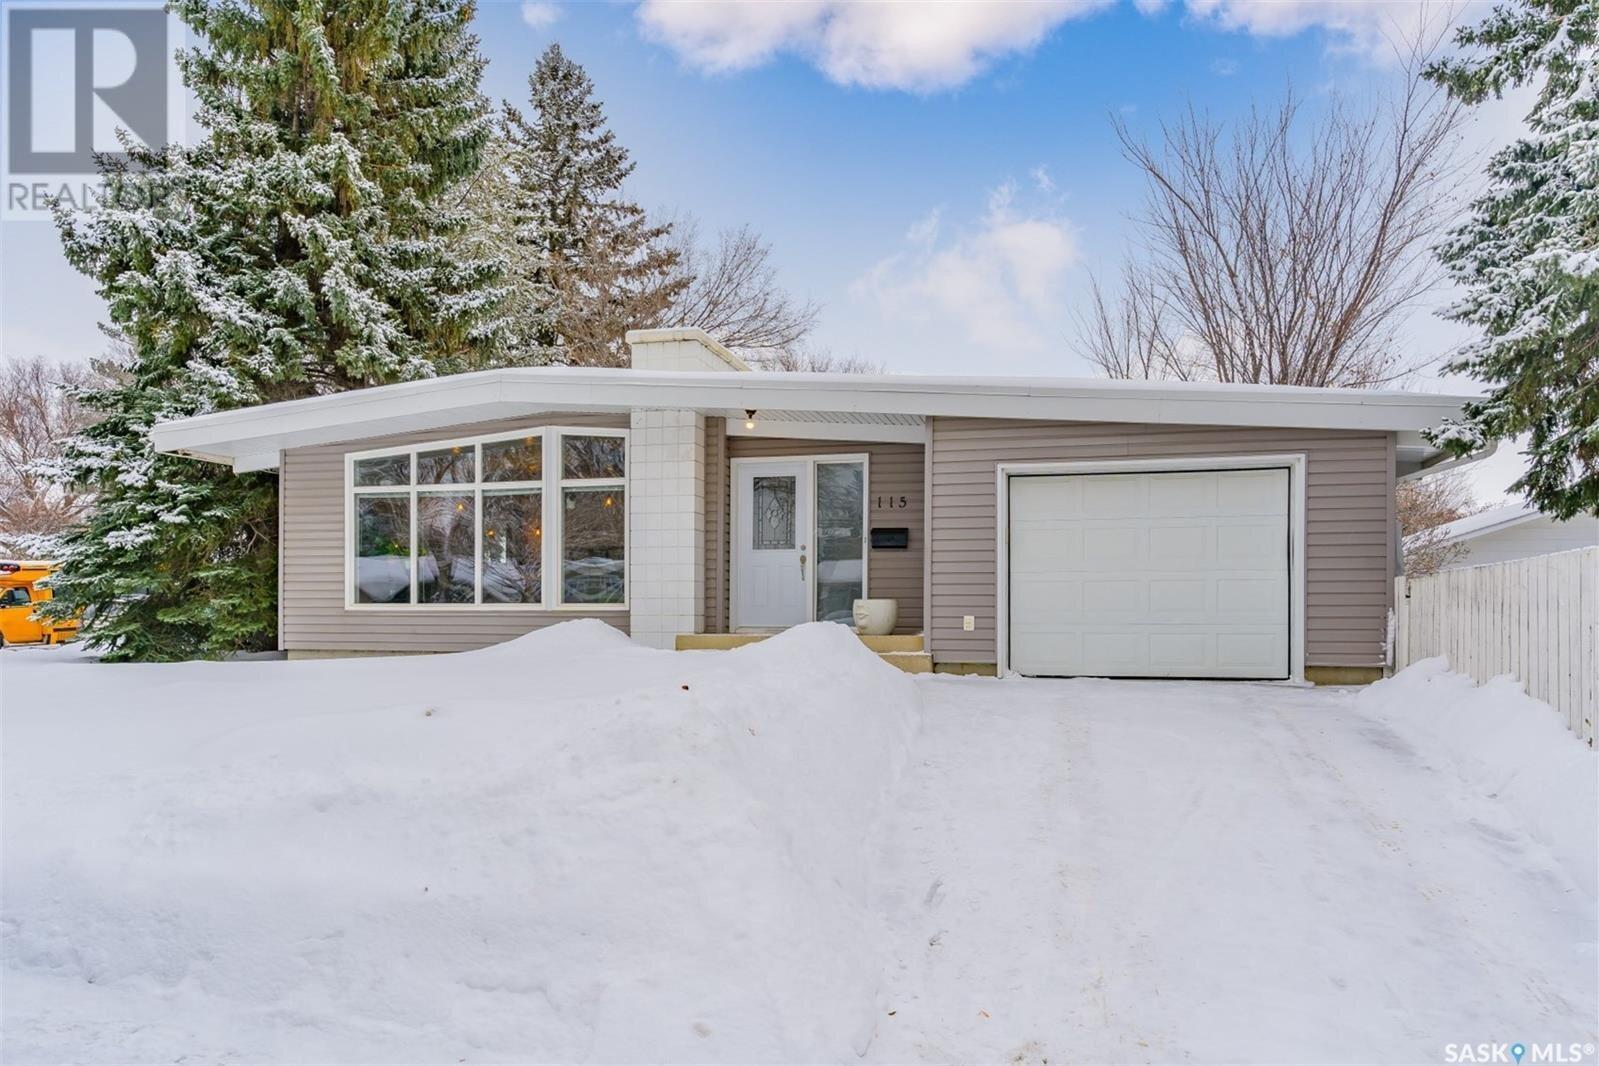 House for sale at 115 Baldwin Cres Saskatoon Saskatchewan - MLS: SK839449